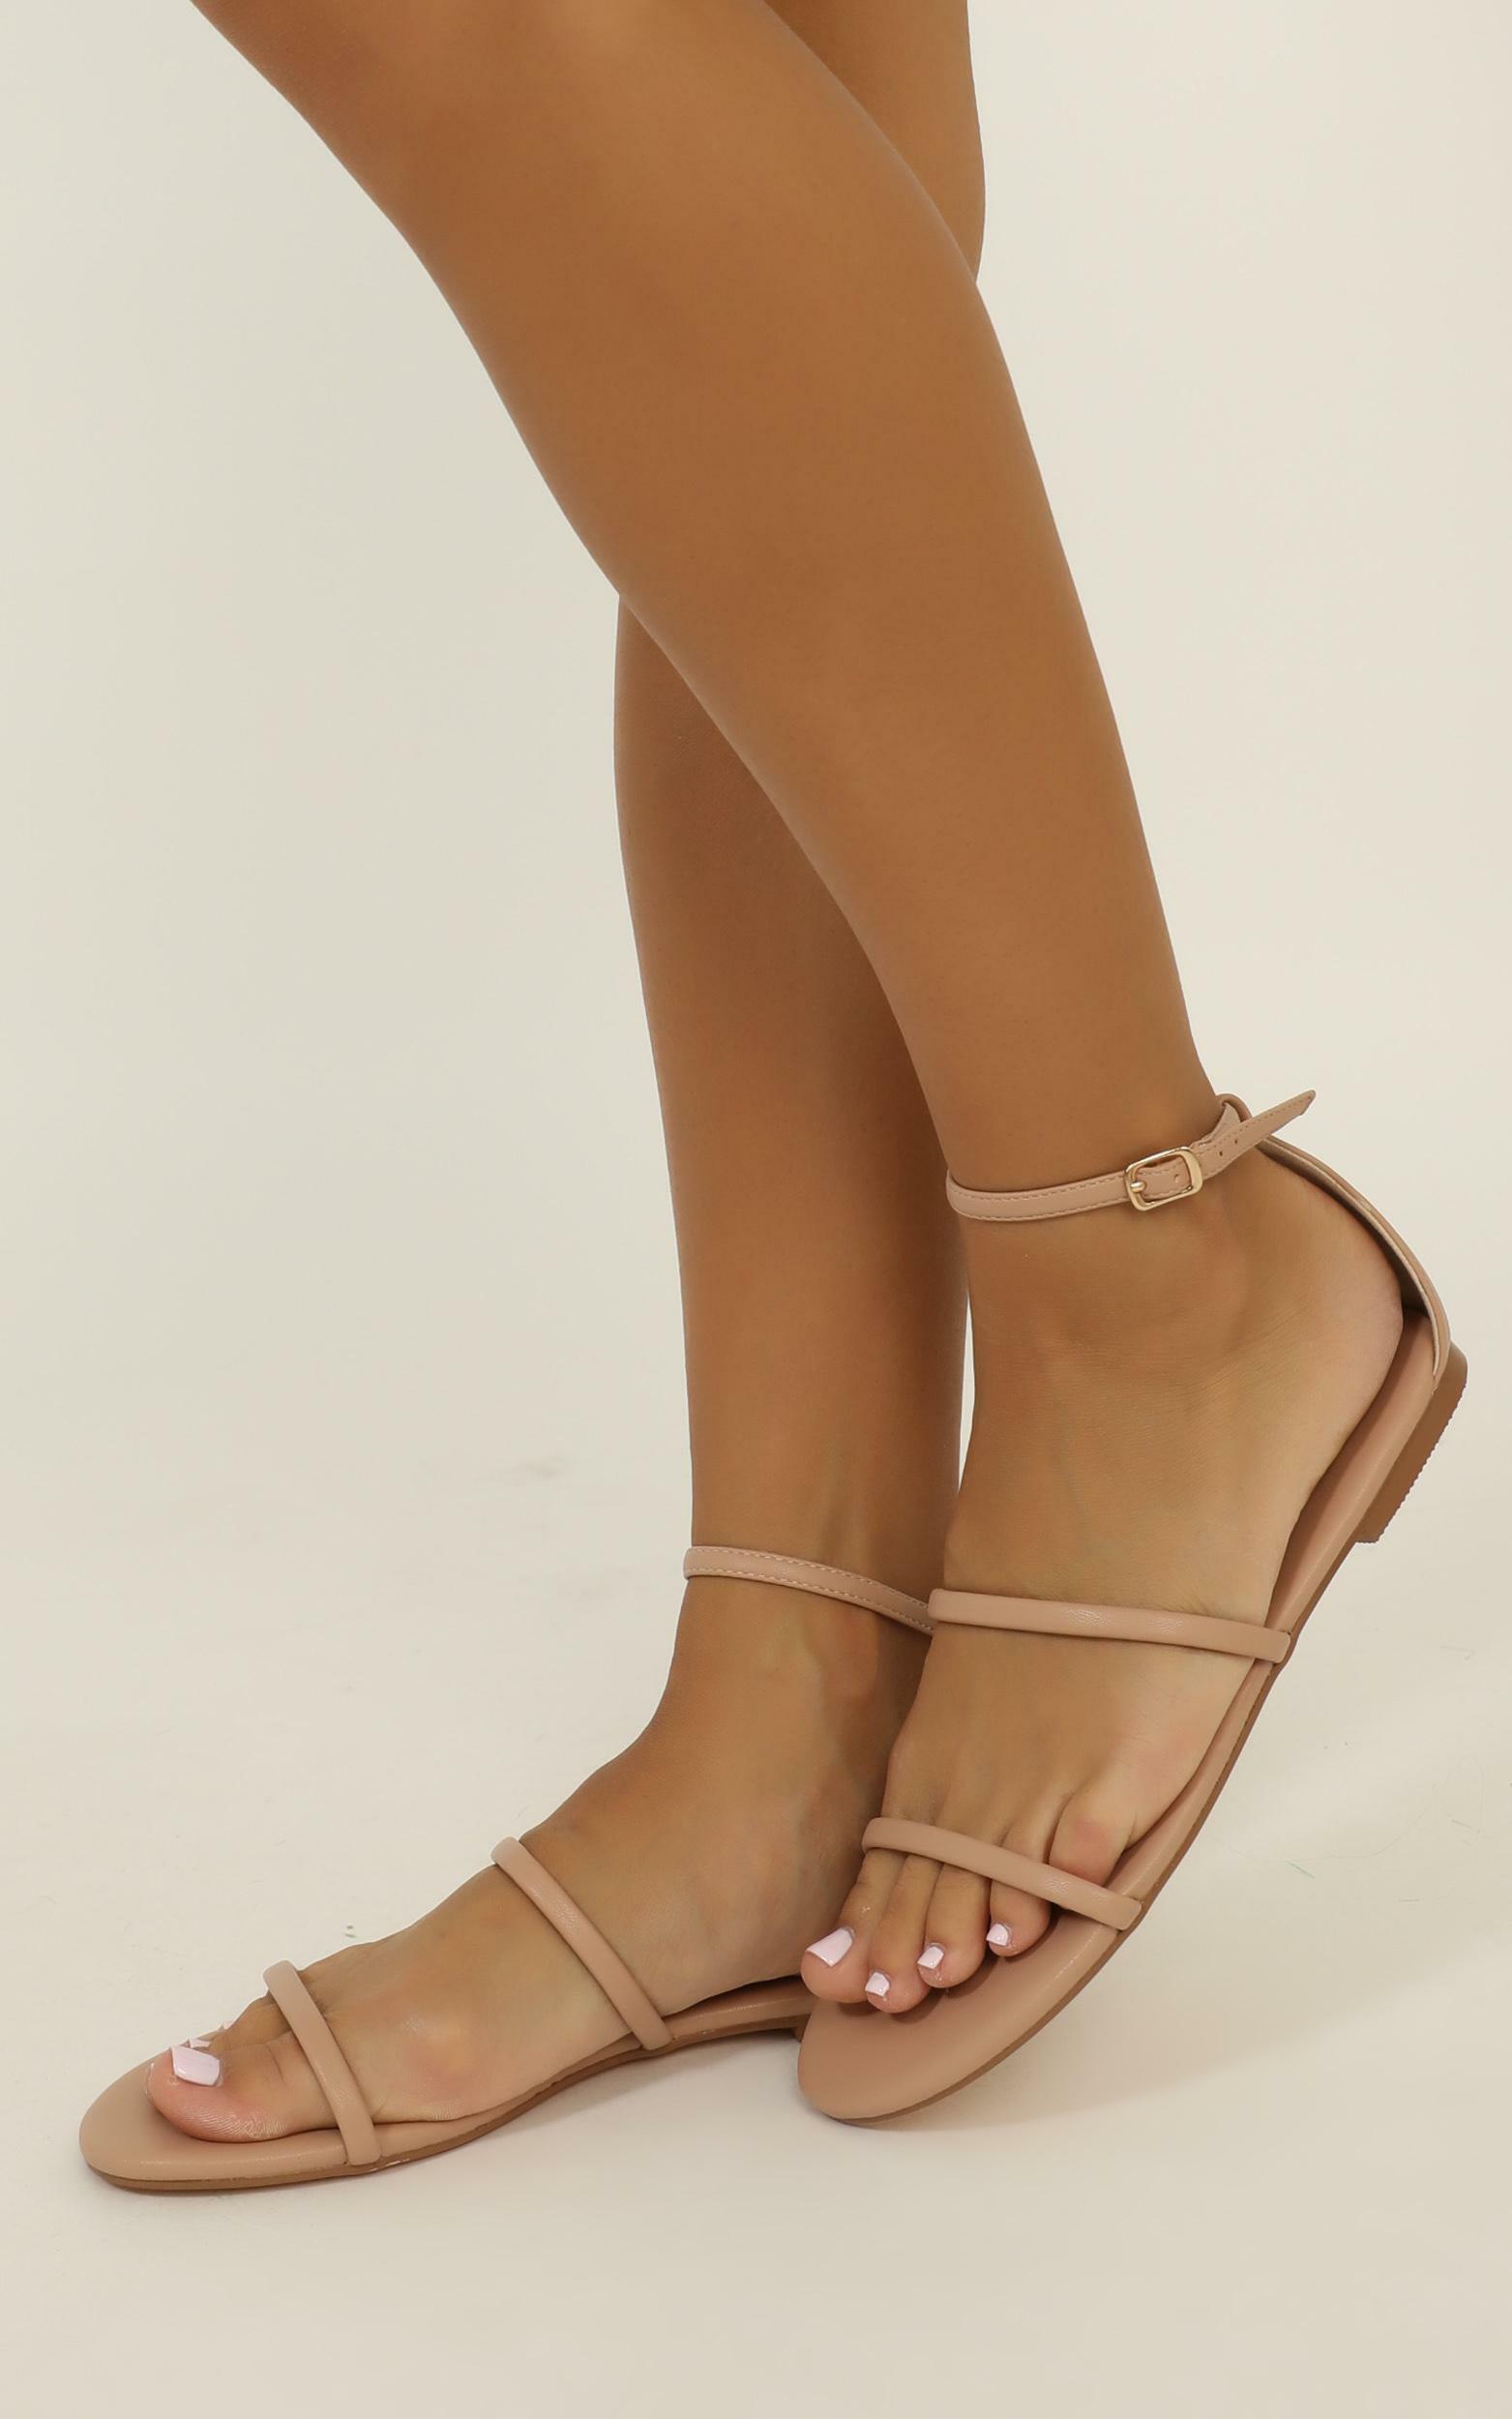 Billini - Iowa sandals in blush - 10, Blush, hi-res image number null